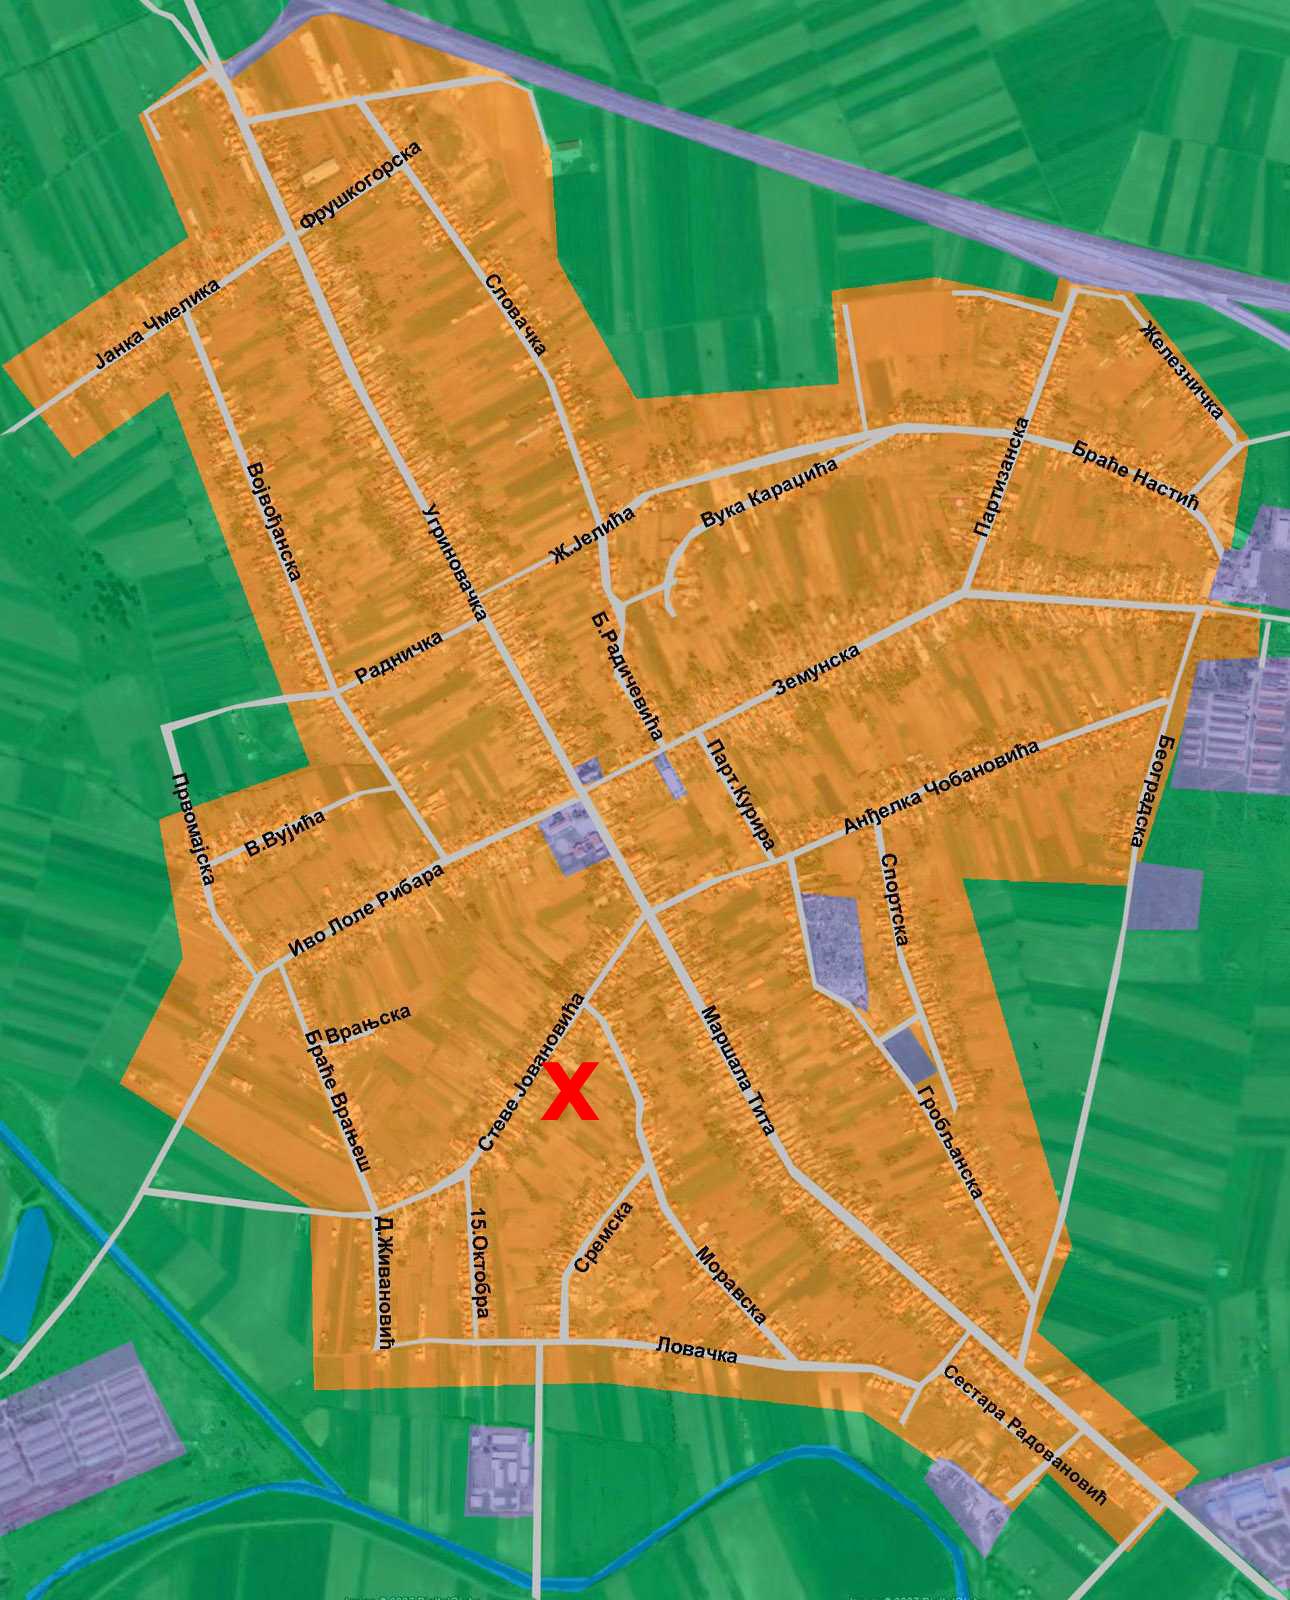 dobanovci mapa Majstor Mika | Beograd | Cirade | Cerade | Tende | PVC folije dobanovci mapa